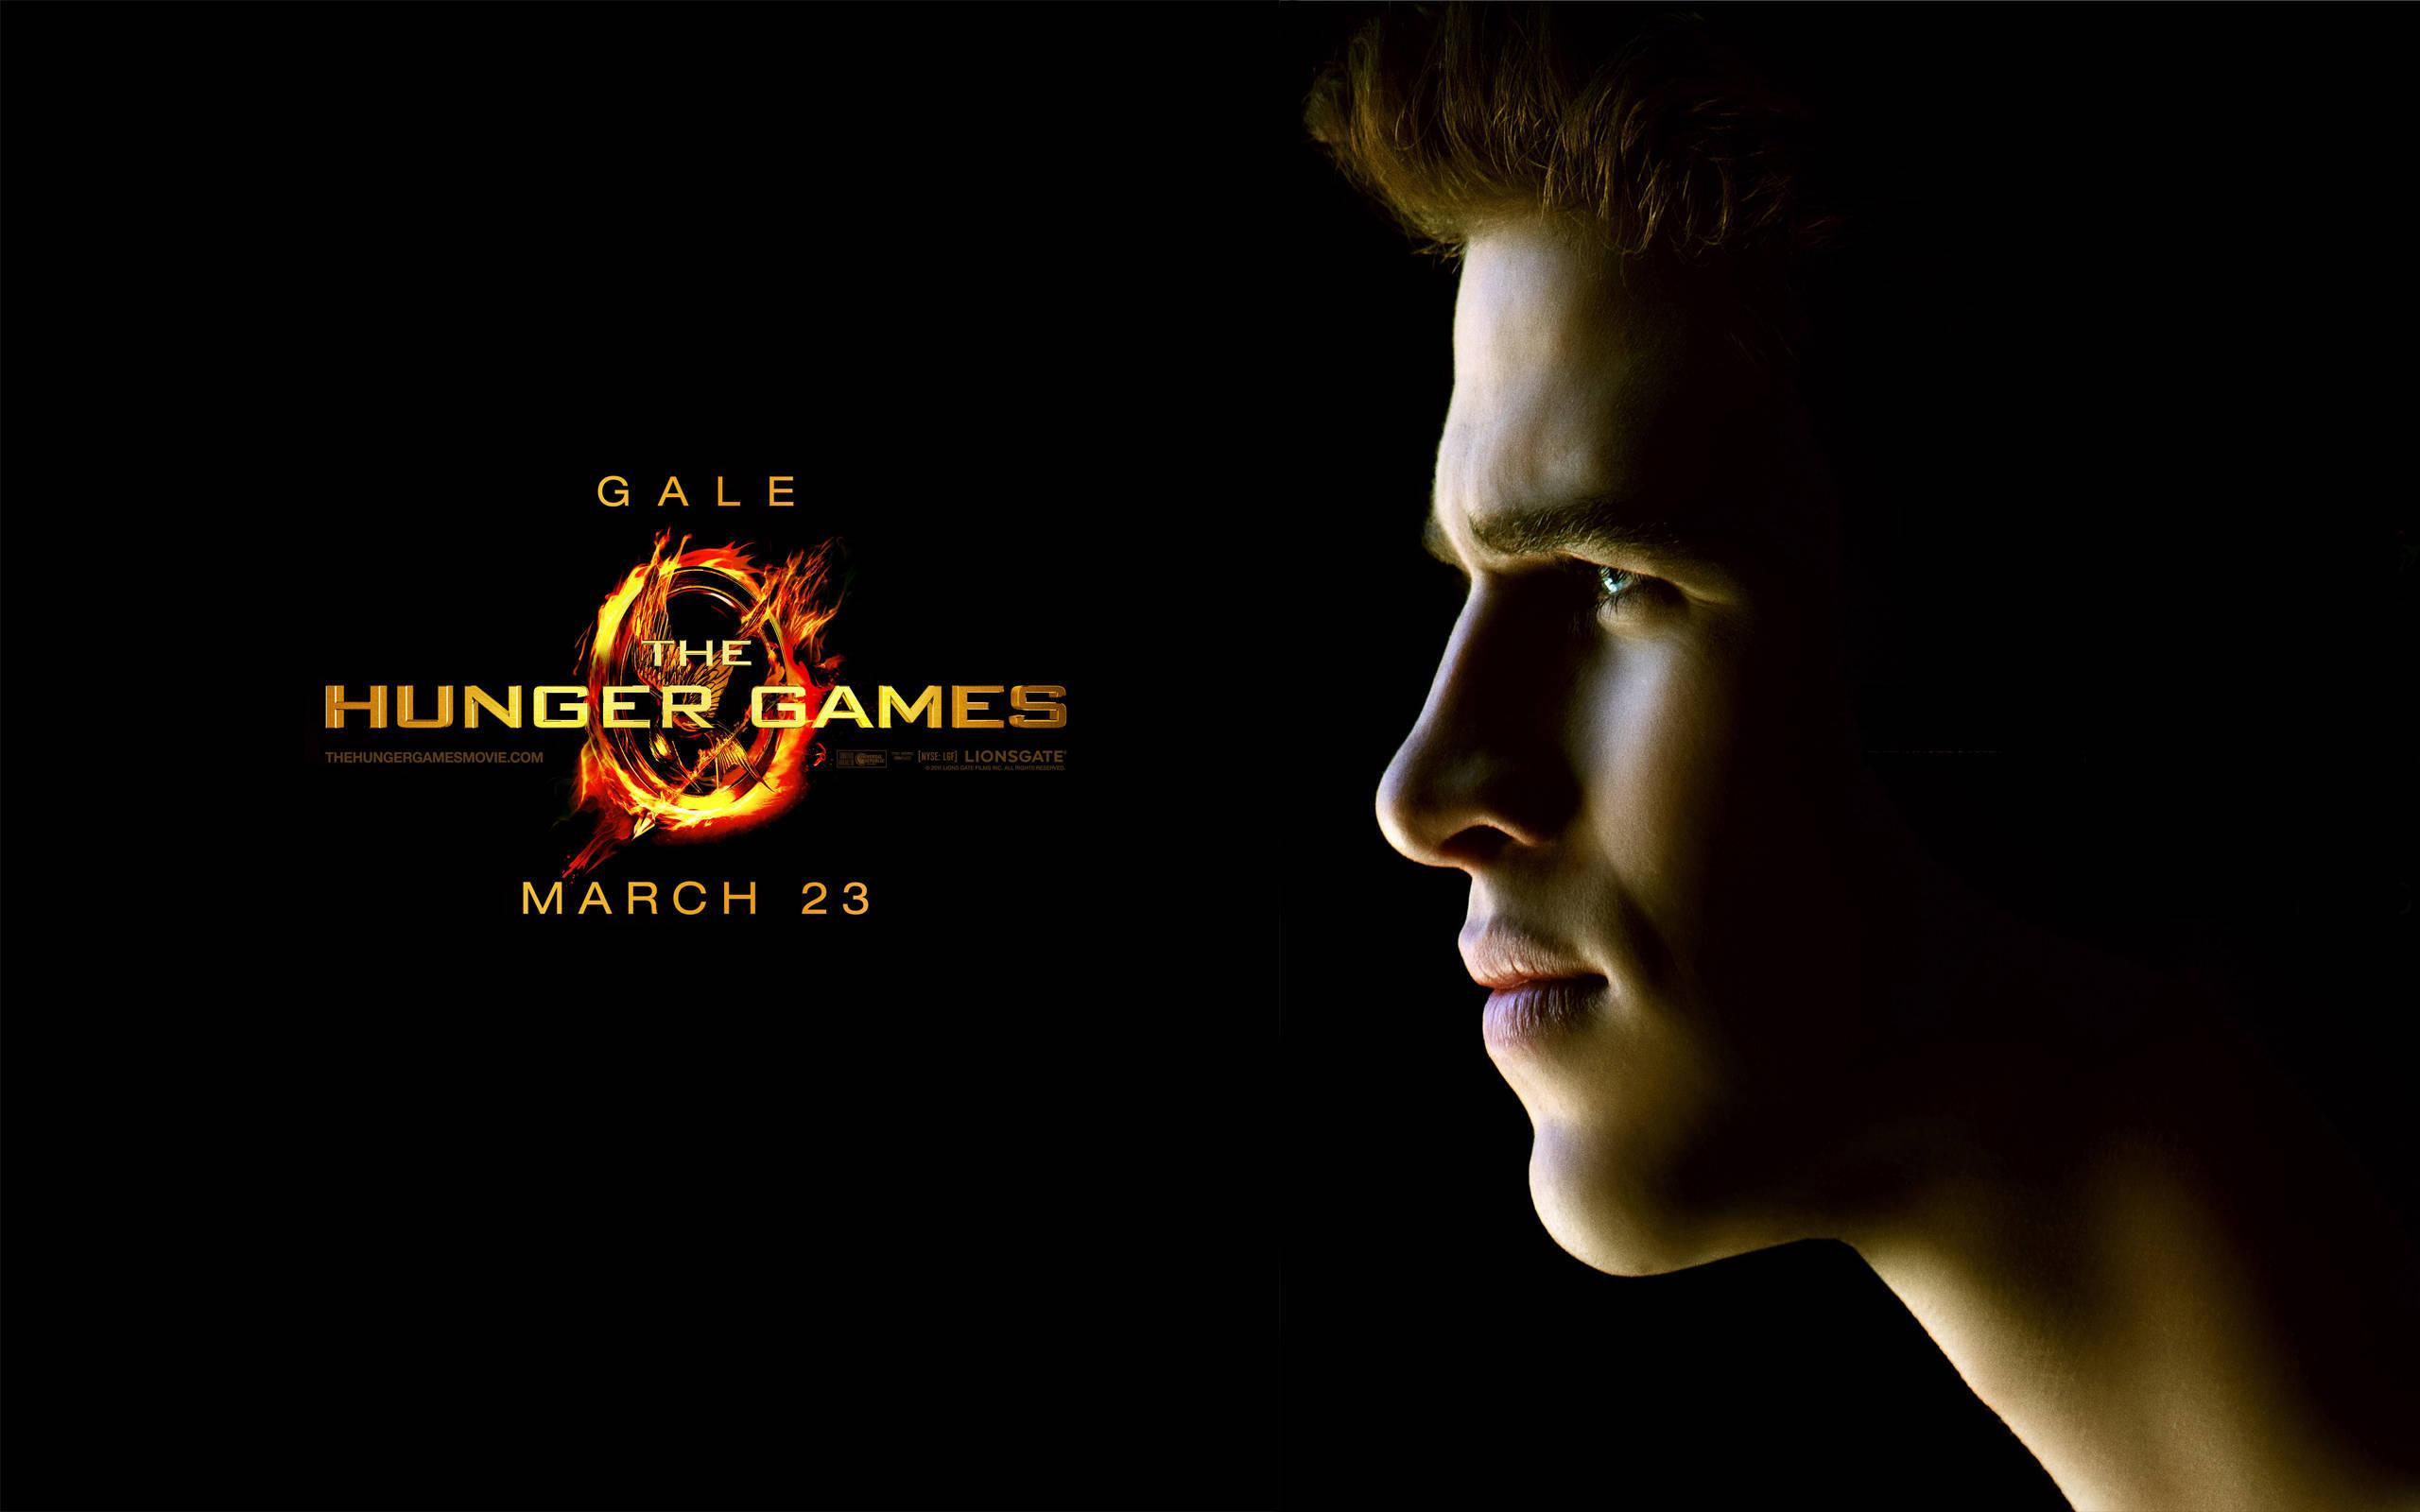 The Hunger Games wallpaper 9